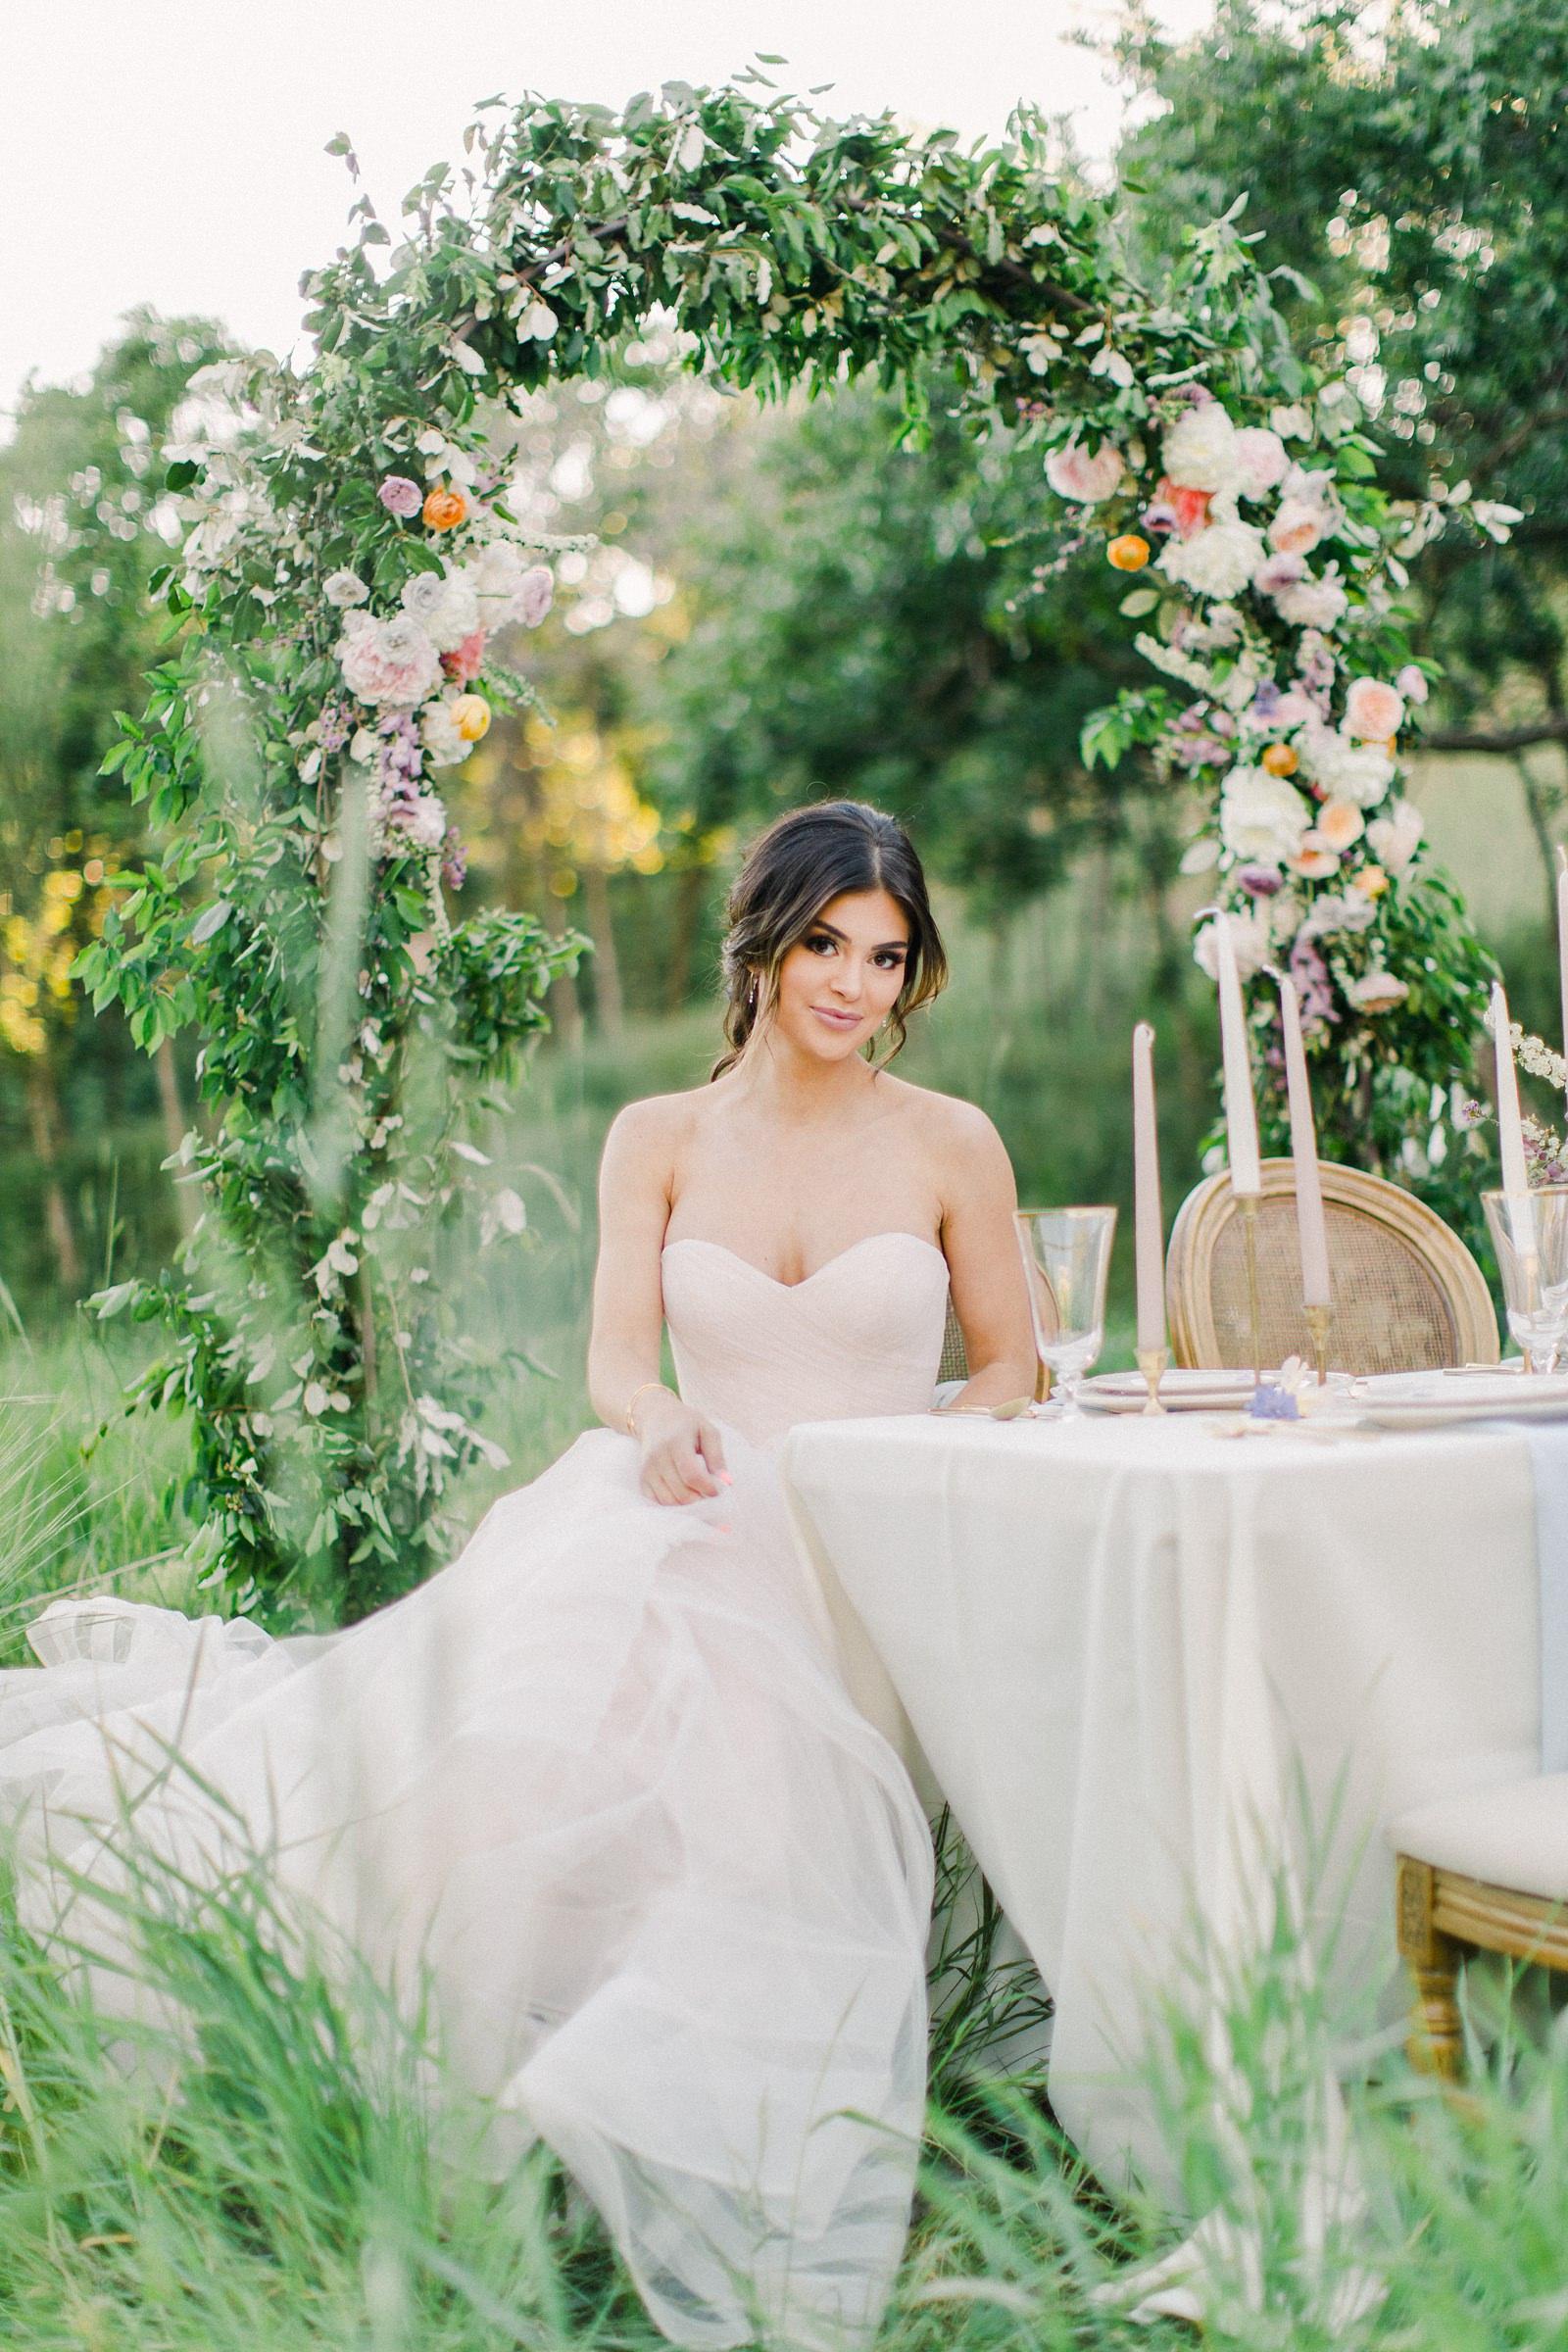 Outdoor Spring Secret Garden Wedding, Provo Utah Film Wedding Photography, floral arch wedding flowers simple white tablescape